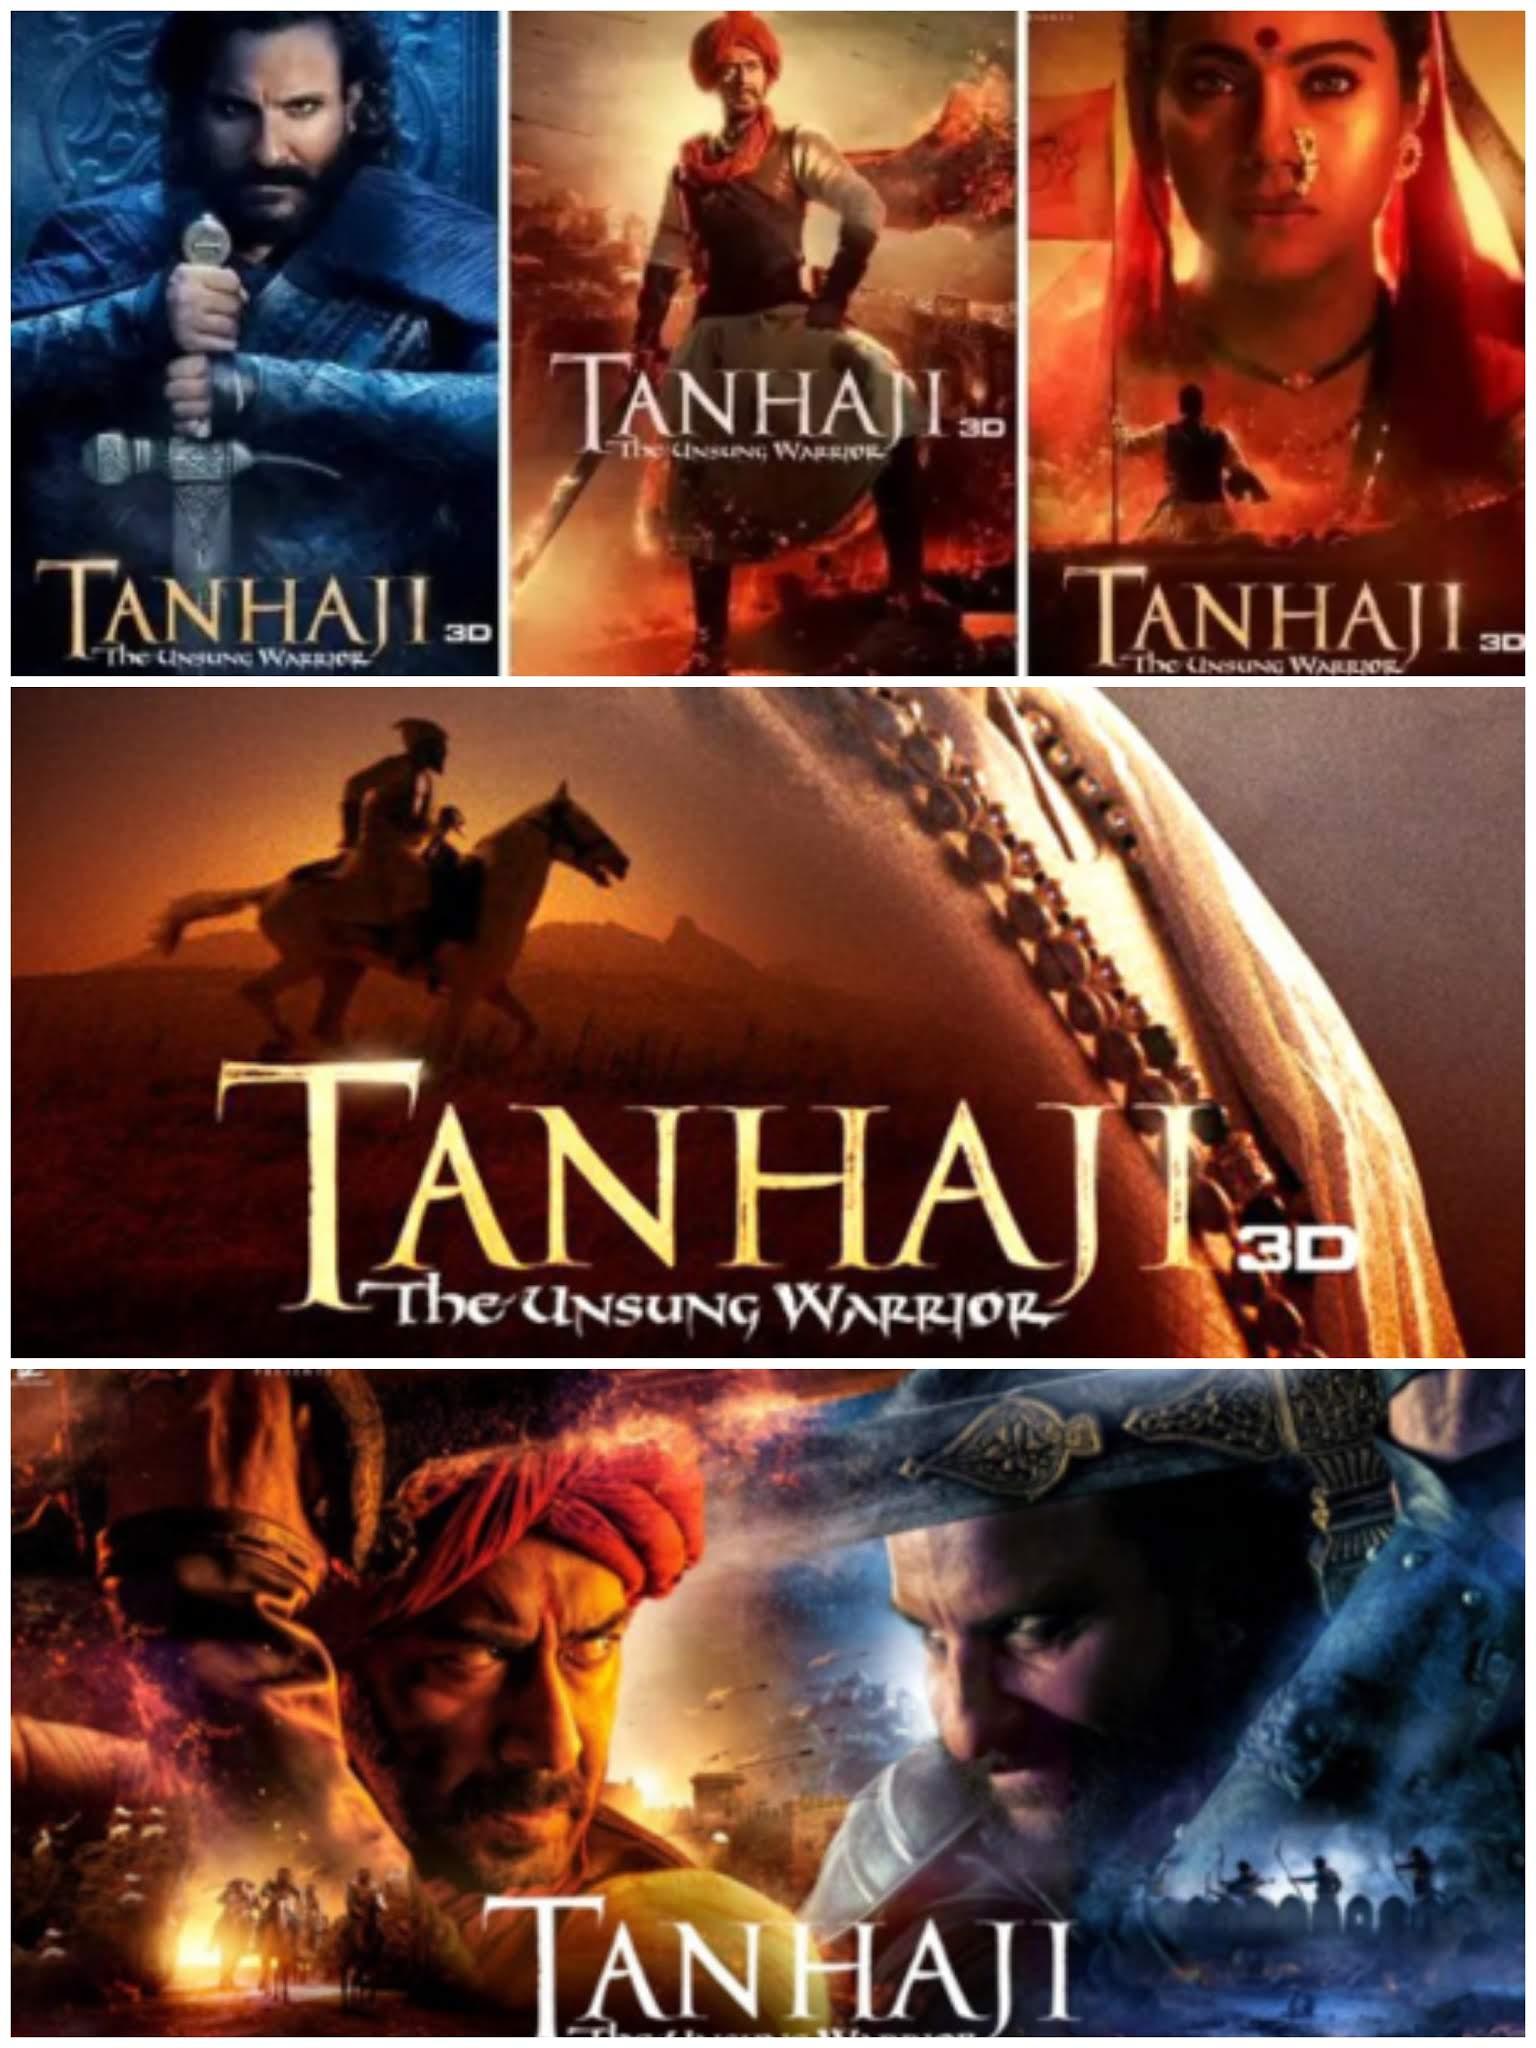 Ra Ra Ra Ra Full Song | Tanhaji Background Music (BGM) | Tanhaji: The Unsung warrior (2020) | Theme Song